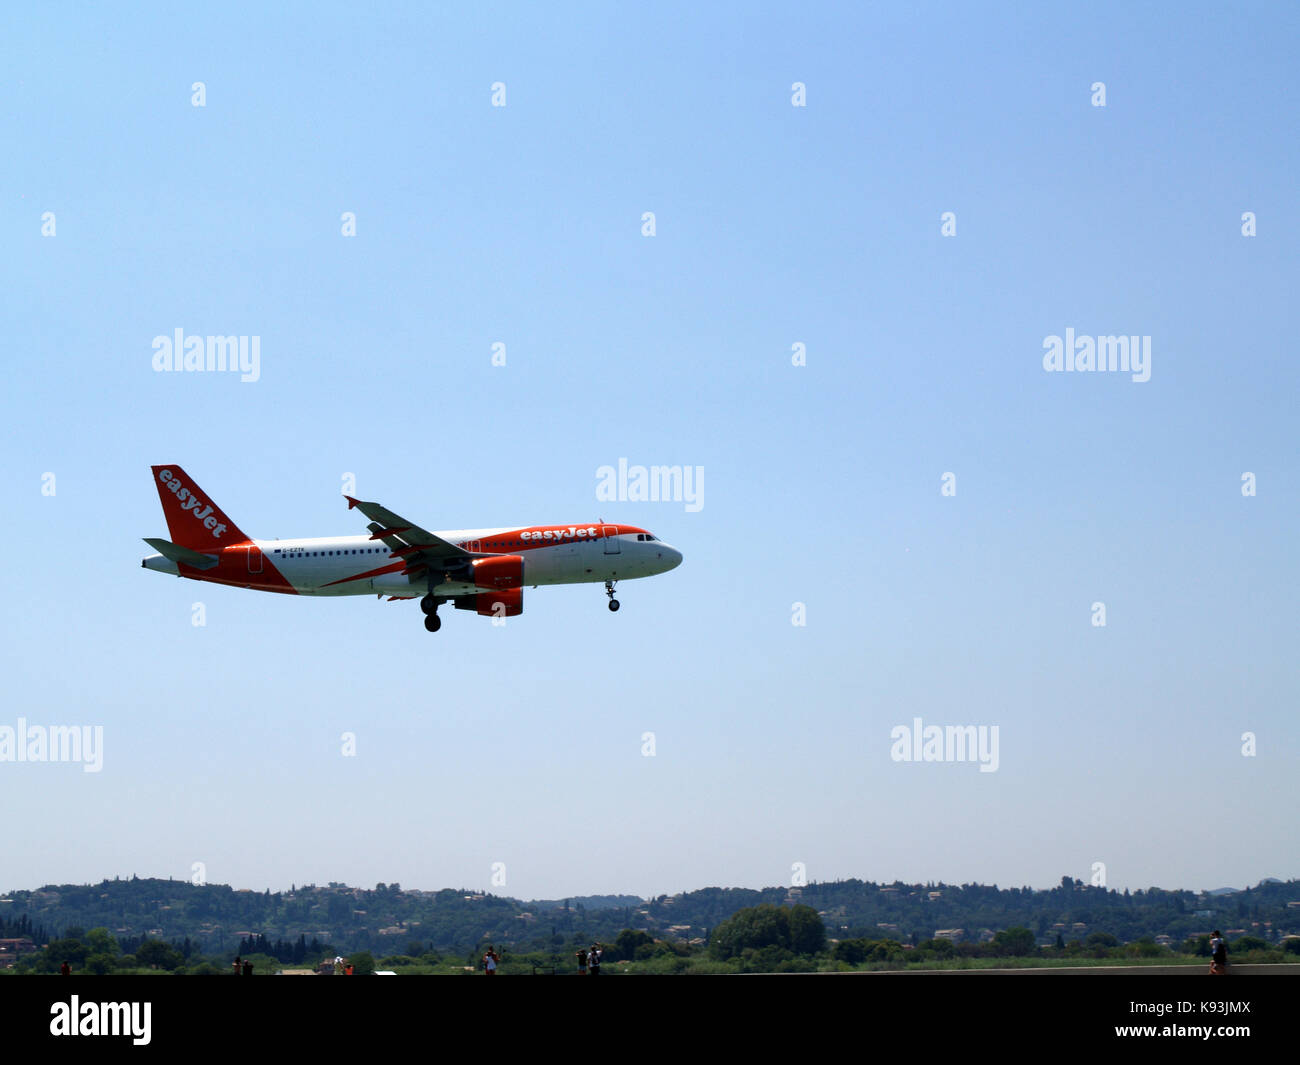 Easyjet airlines Airbus A320-214, flight number G-EZTK landing off at Ioannis Kaposistrias airport Corfu, Greece - Stock Image